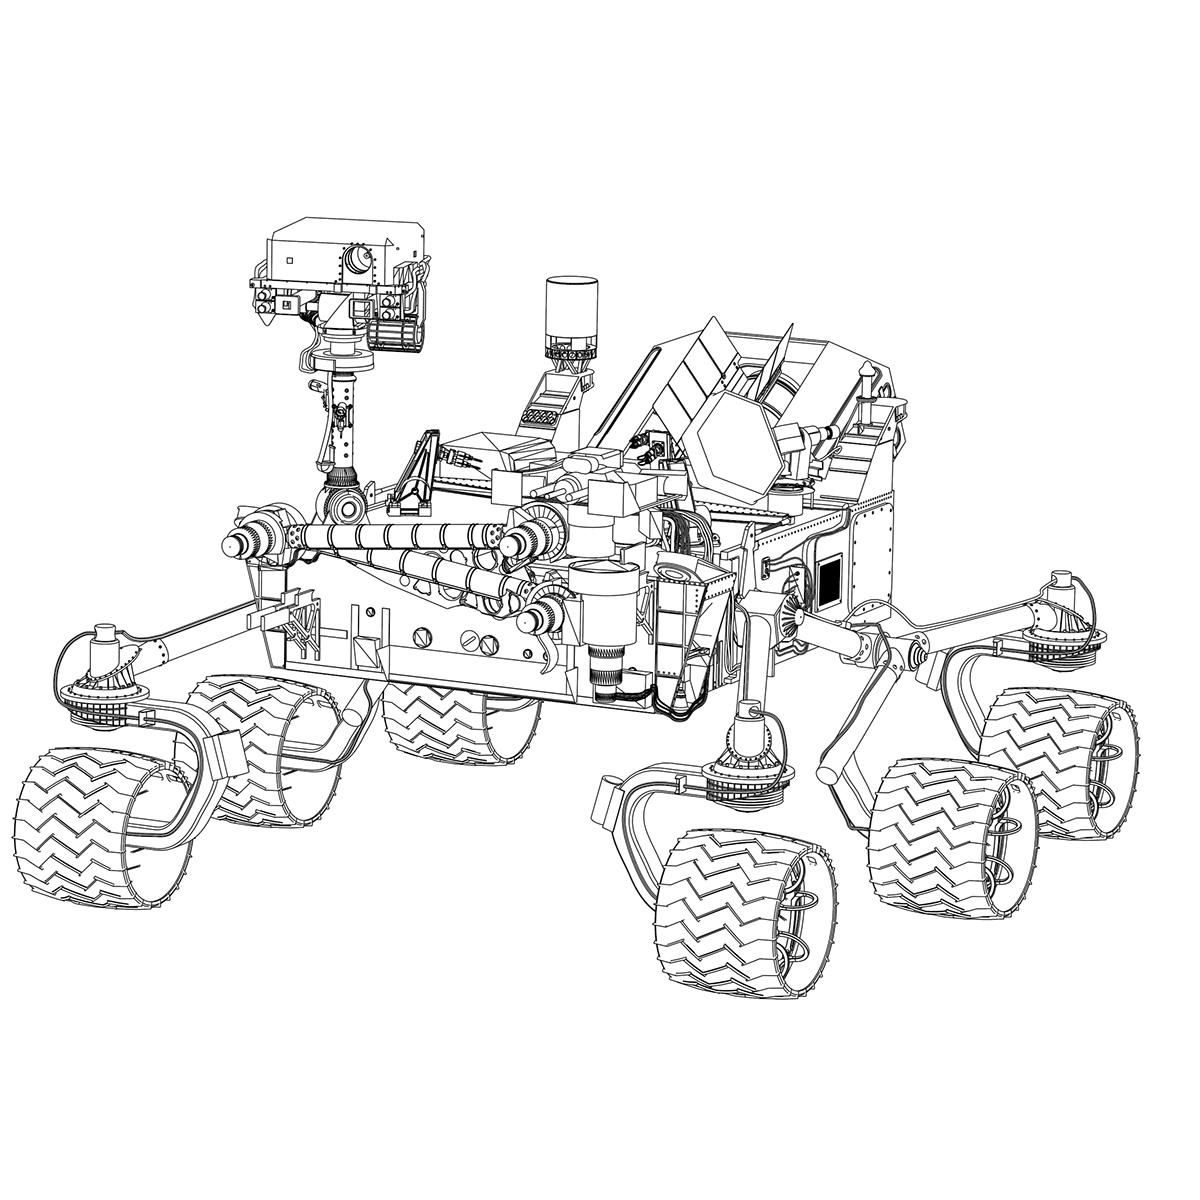 1200x1200 Mars Science Laboratory Rover On Behance